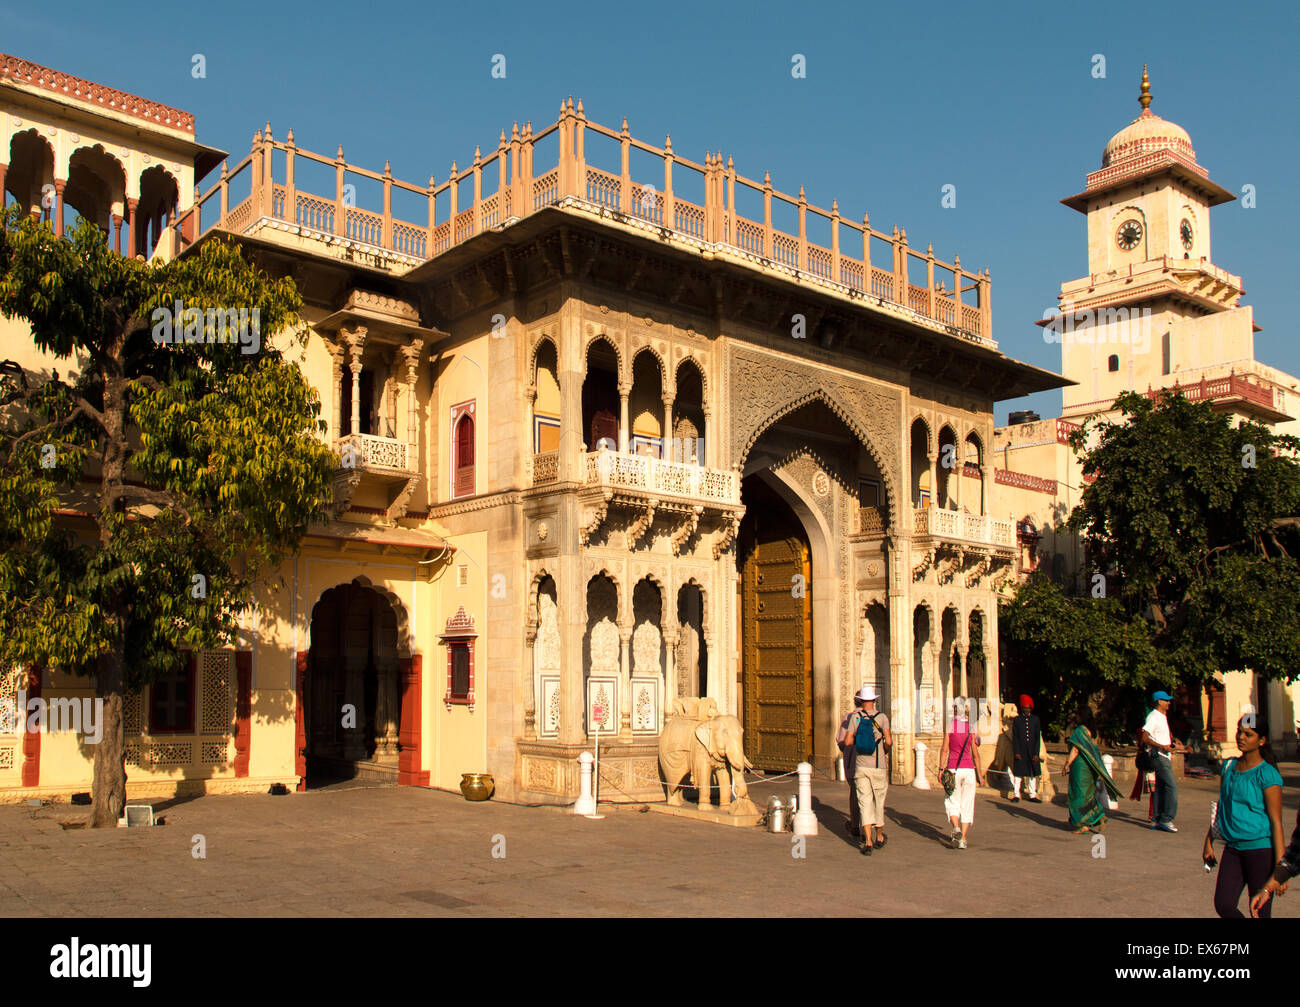 Entrance to the city palace of Jai Singh II., Chandra Mahal, Jaipur, Rajasthan, India - Stock Image